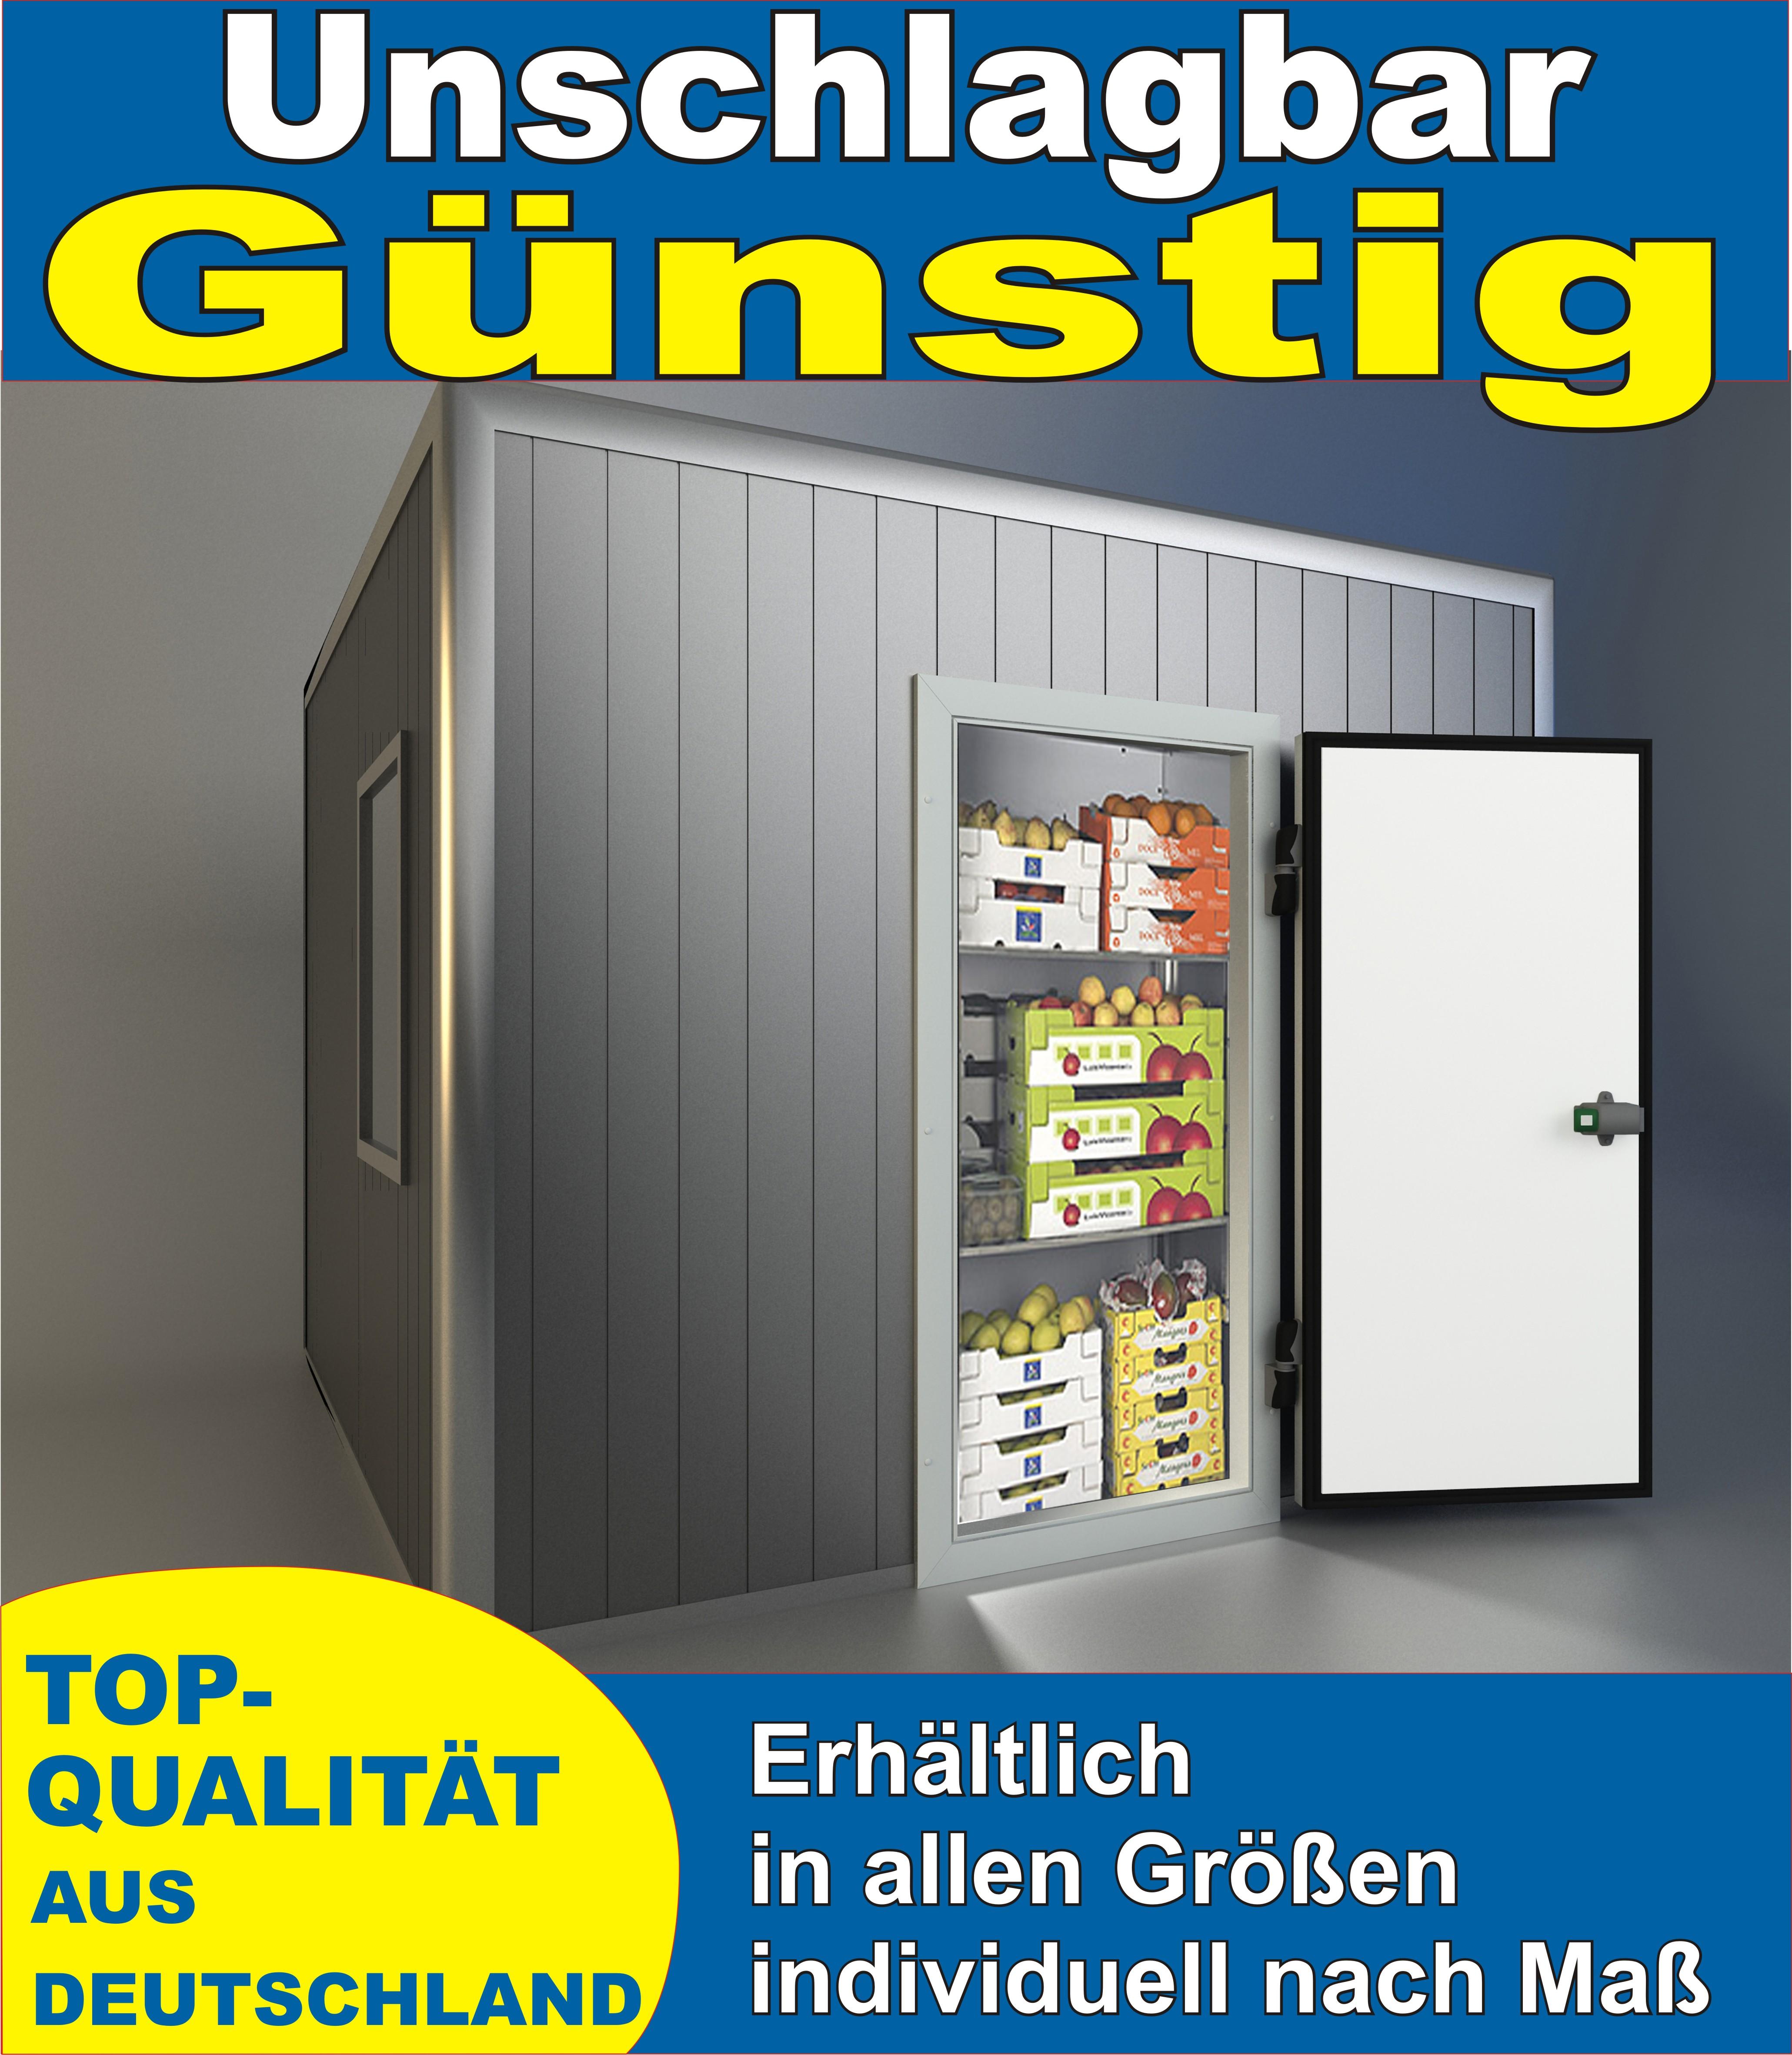 Berühmt Kühlzelle Kühlhaus Kühlraum in Langenfeld   Büro, Geschäft #XK_62